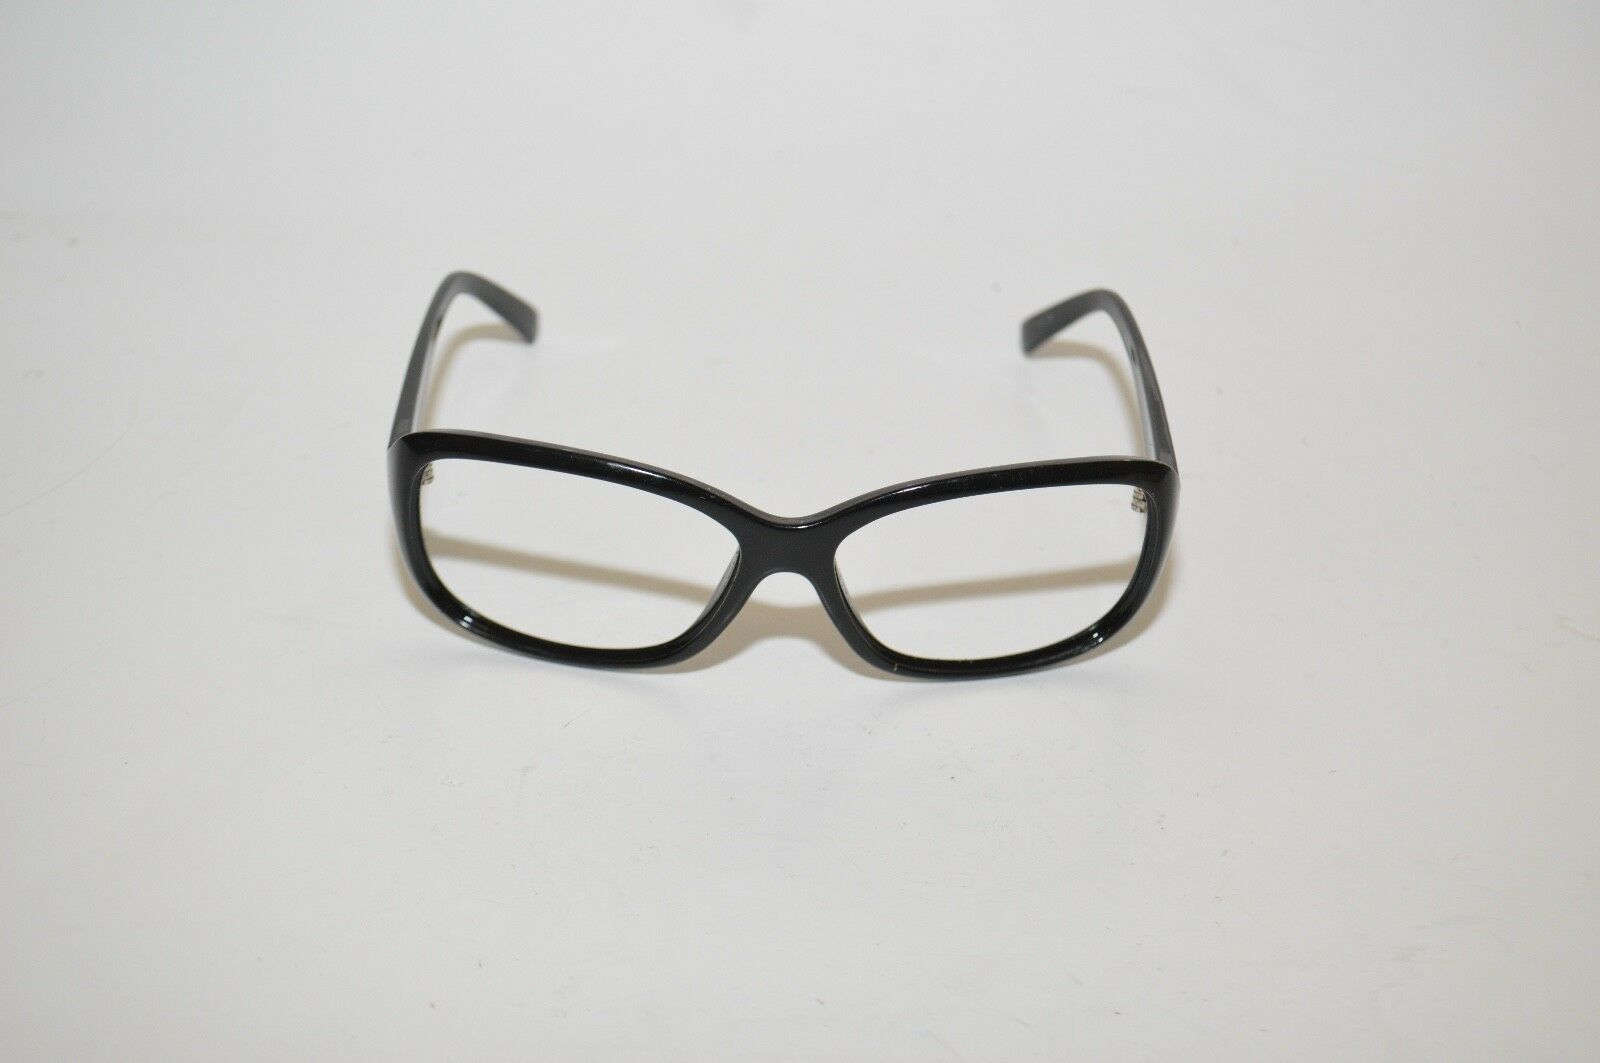 Bolle Molly Sunglass/Eyeglass Frames 11510 EI Black Made in Italy